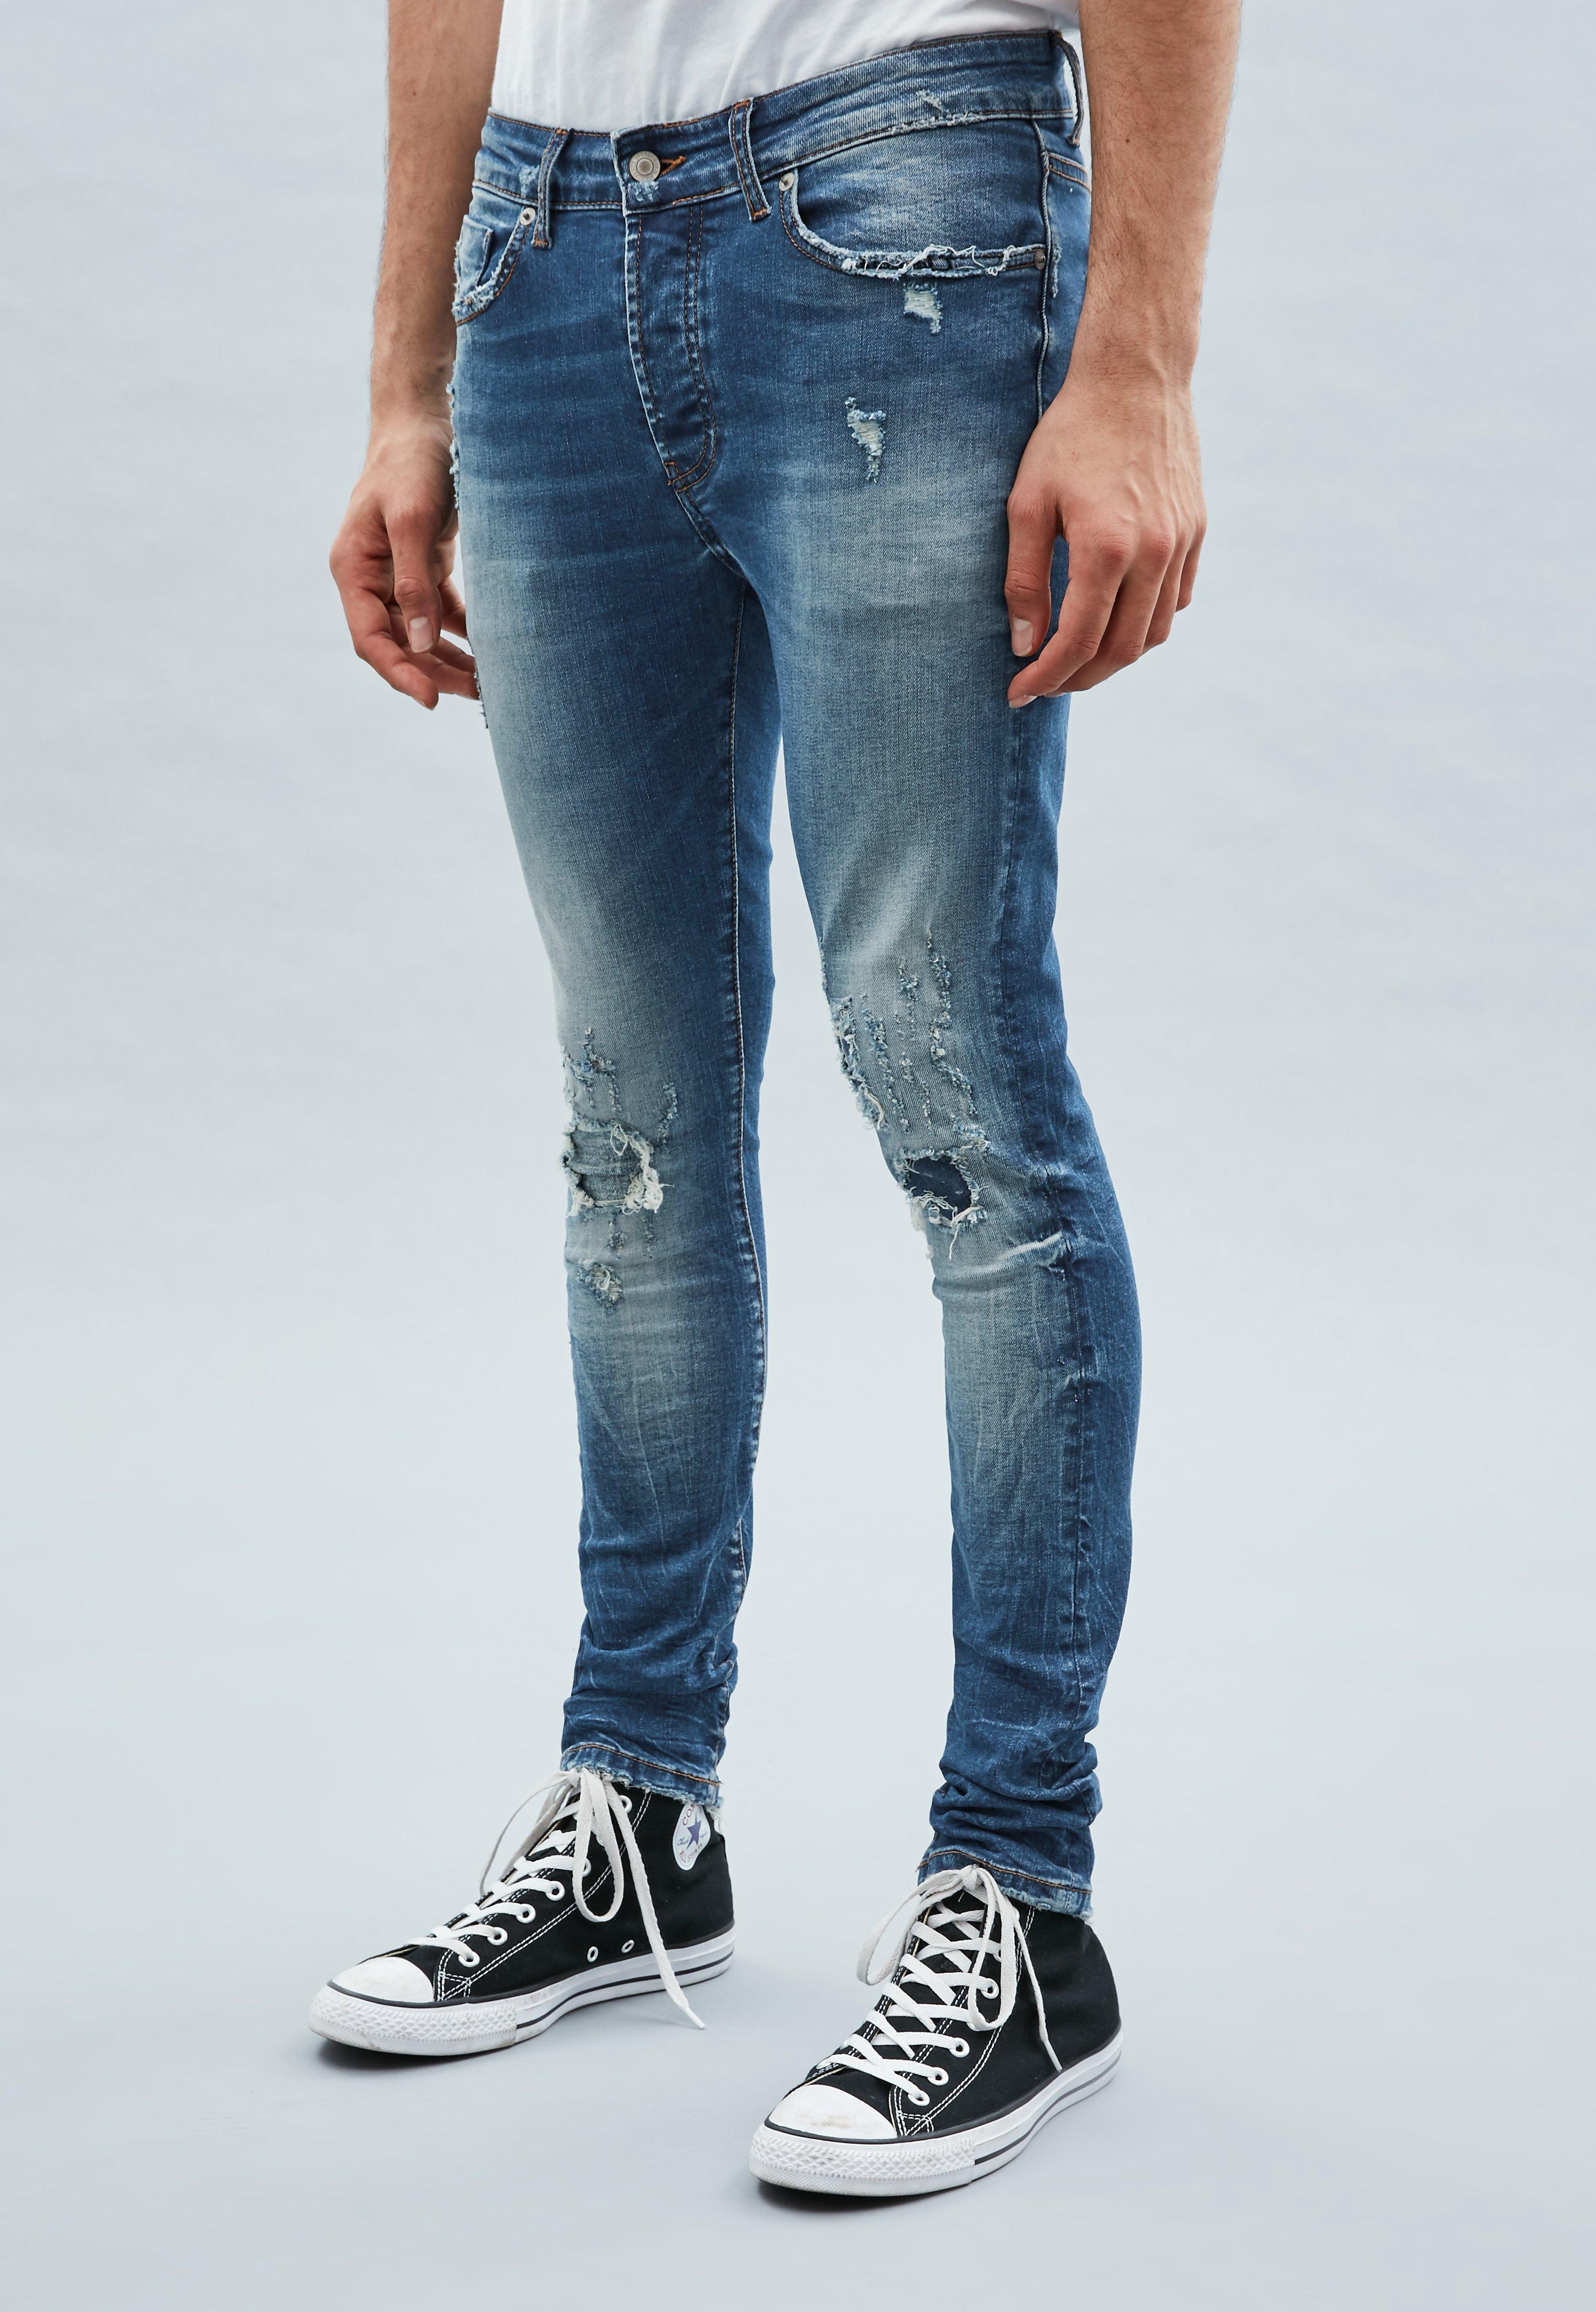 f0765c6f32e Men s Super Skinny Jeans